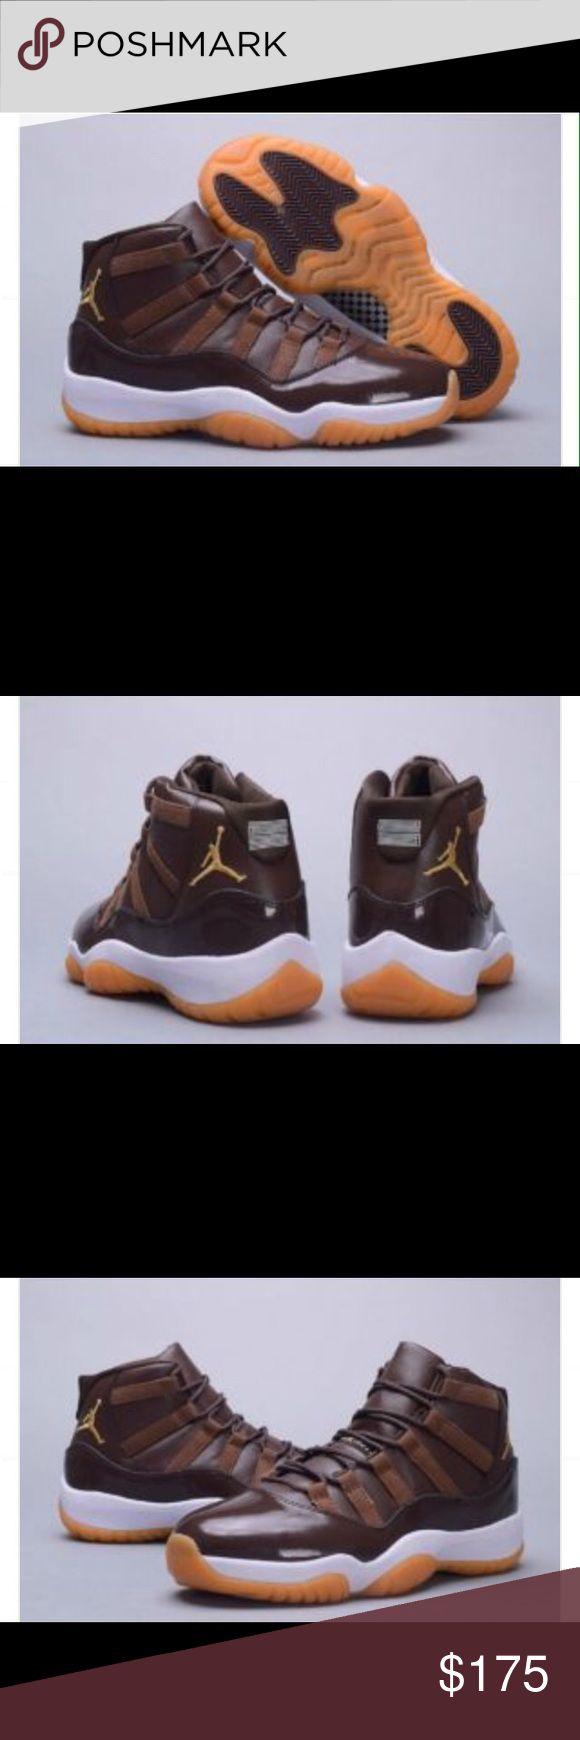 Air Jordan's Retro 11 Basketball Shoes Air Jordan Retro 11 Men's sizes 7-14 Jordan Shoes Athletic Shoes